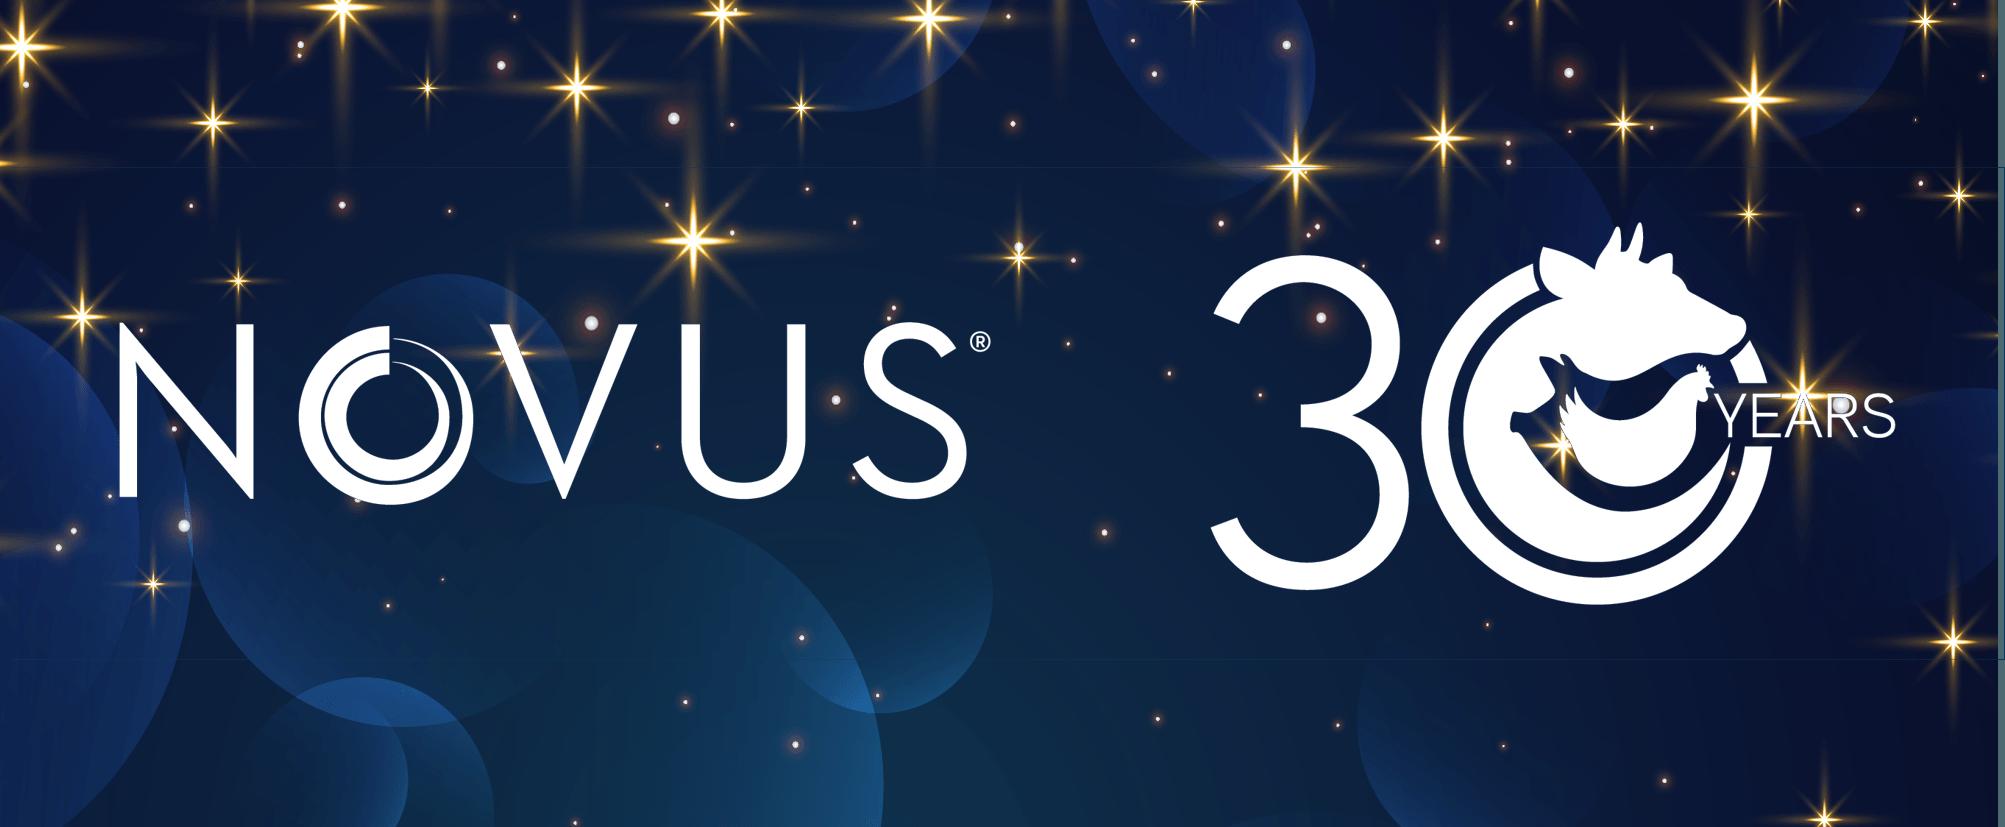 Novus Celebrates 30 Years!